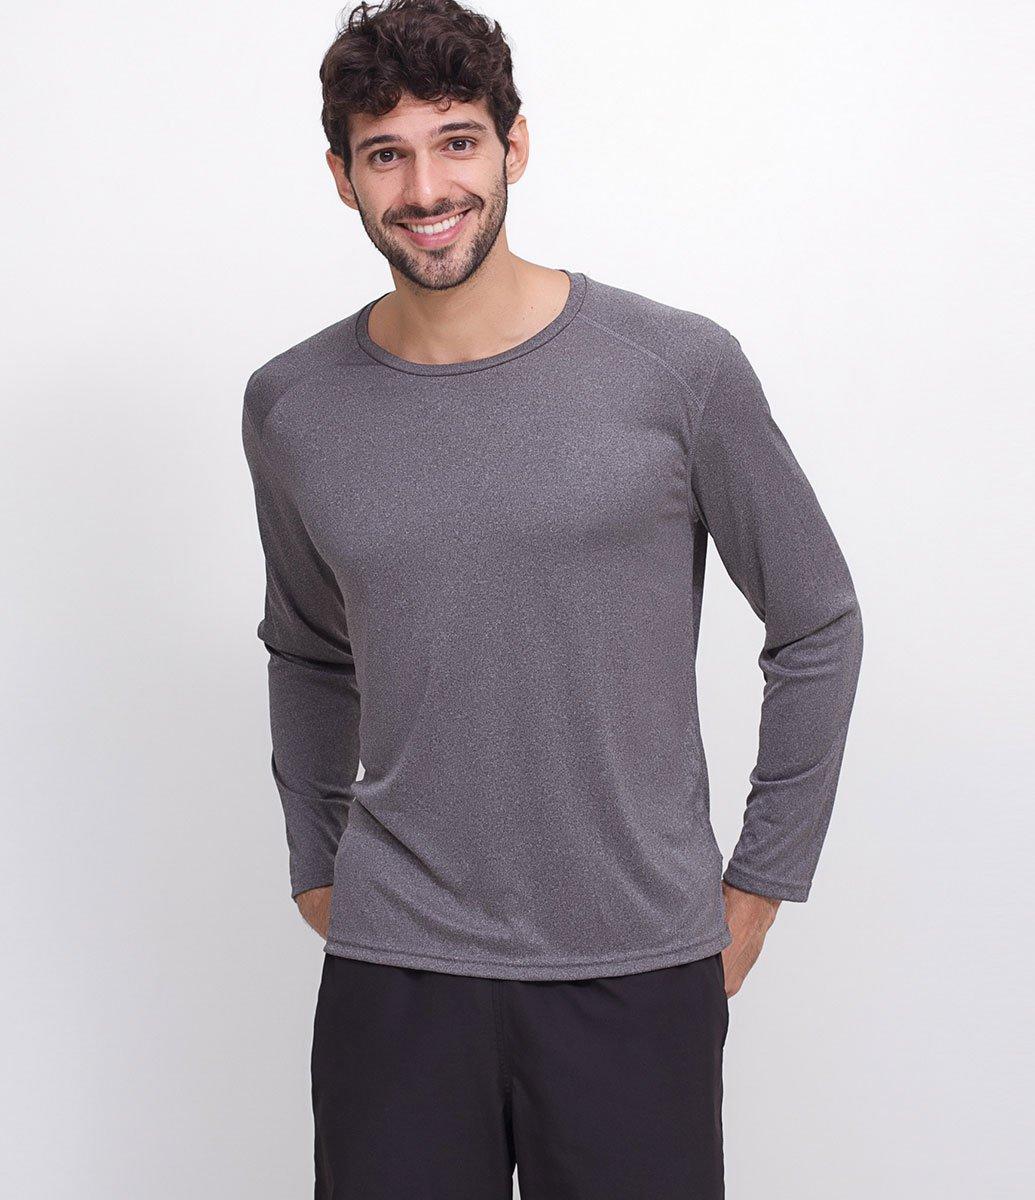 d1e8bbb40c85f9 Detalhes. Camiseta masculina; Modelo esportivo ...